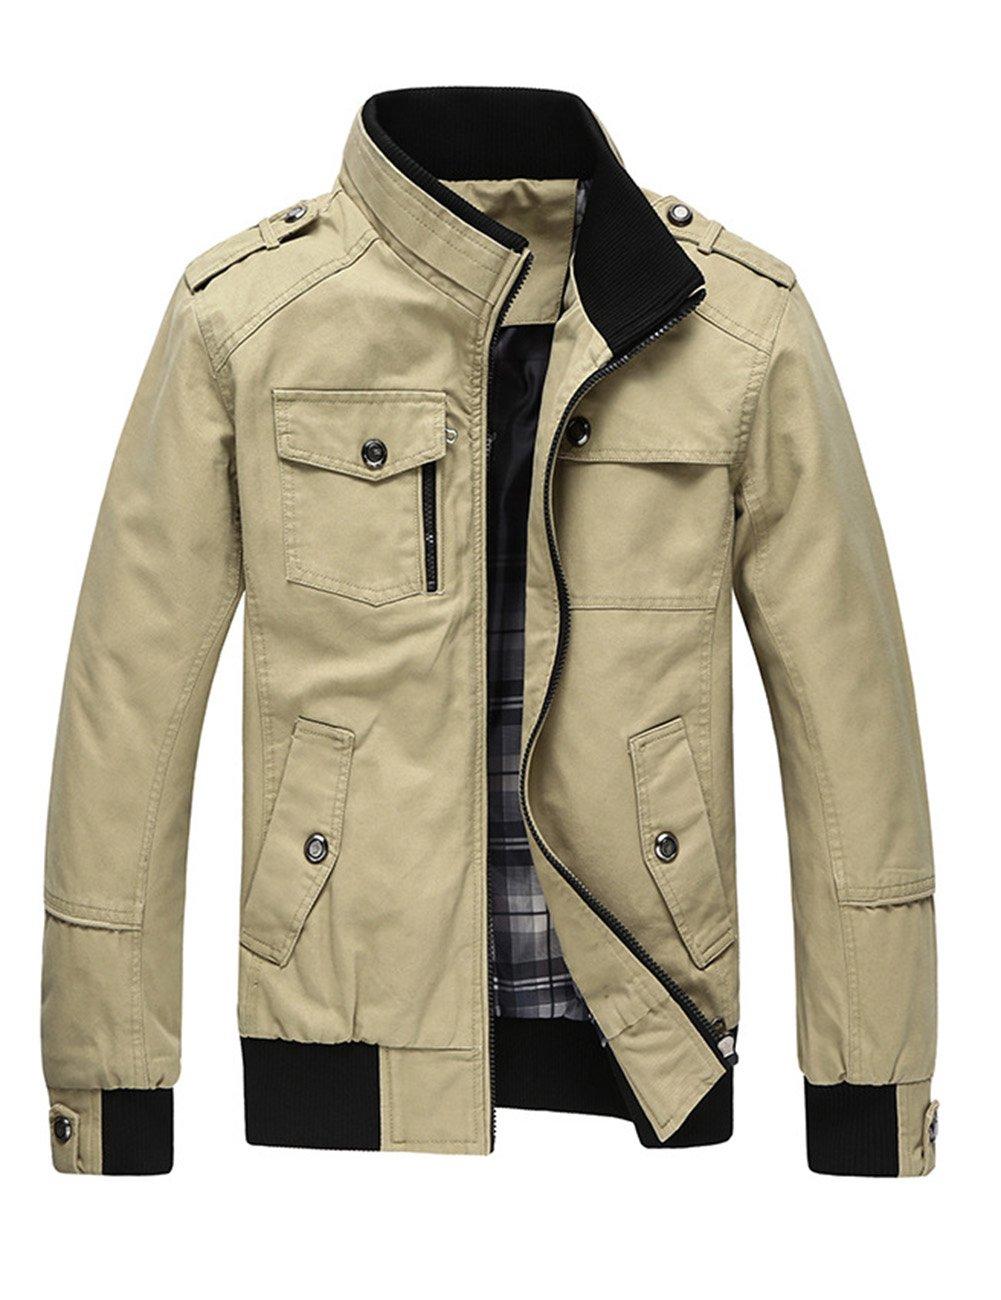 LanLan Autumn Men's Cotton Windbreake Jacket Fashion Coat with Zip Closure Khaki XL